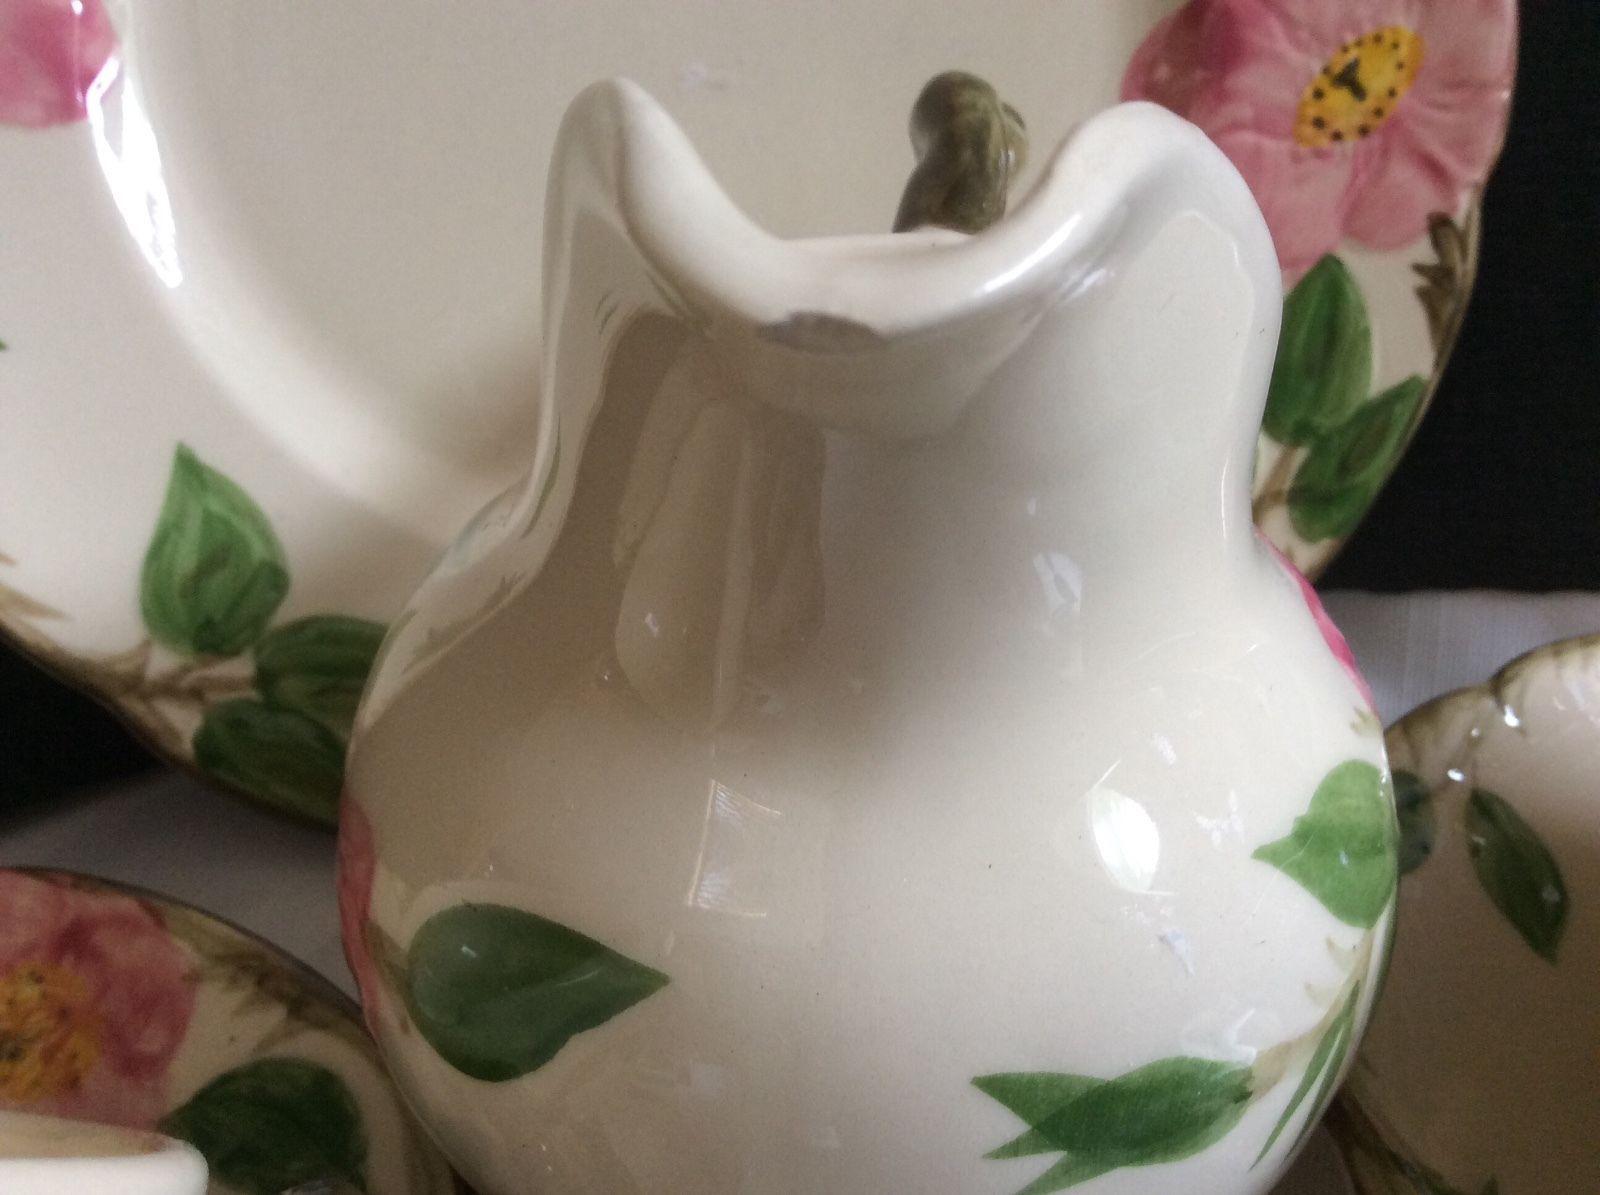 Lot 6 pieces Franciscan Desert Rose Pitcher Creamer cups saucers salad plate